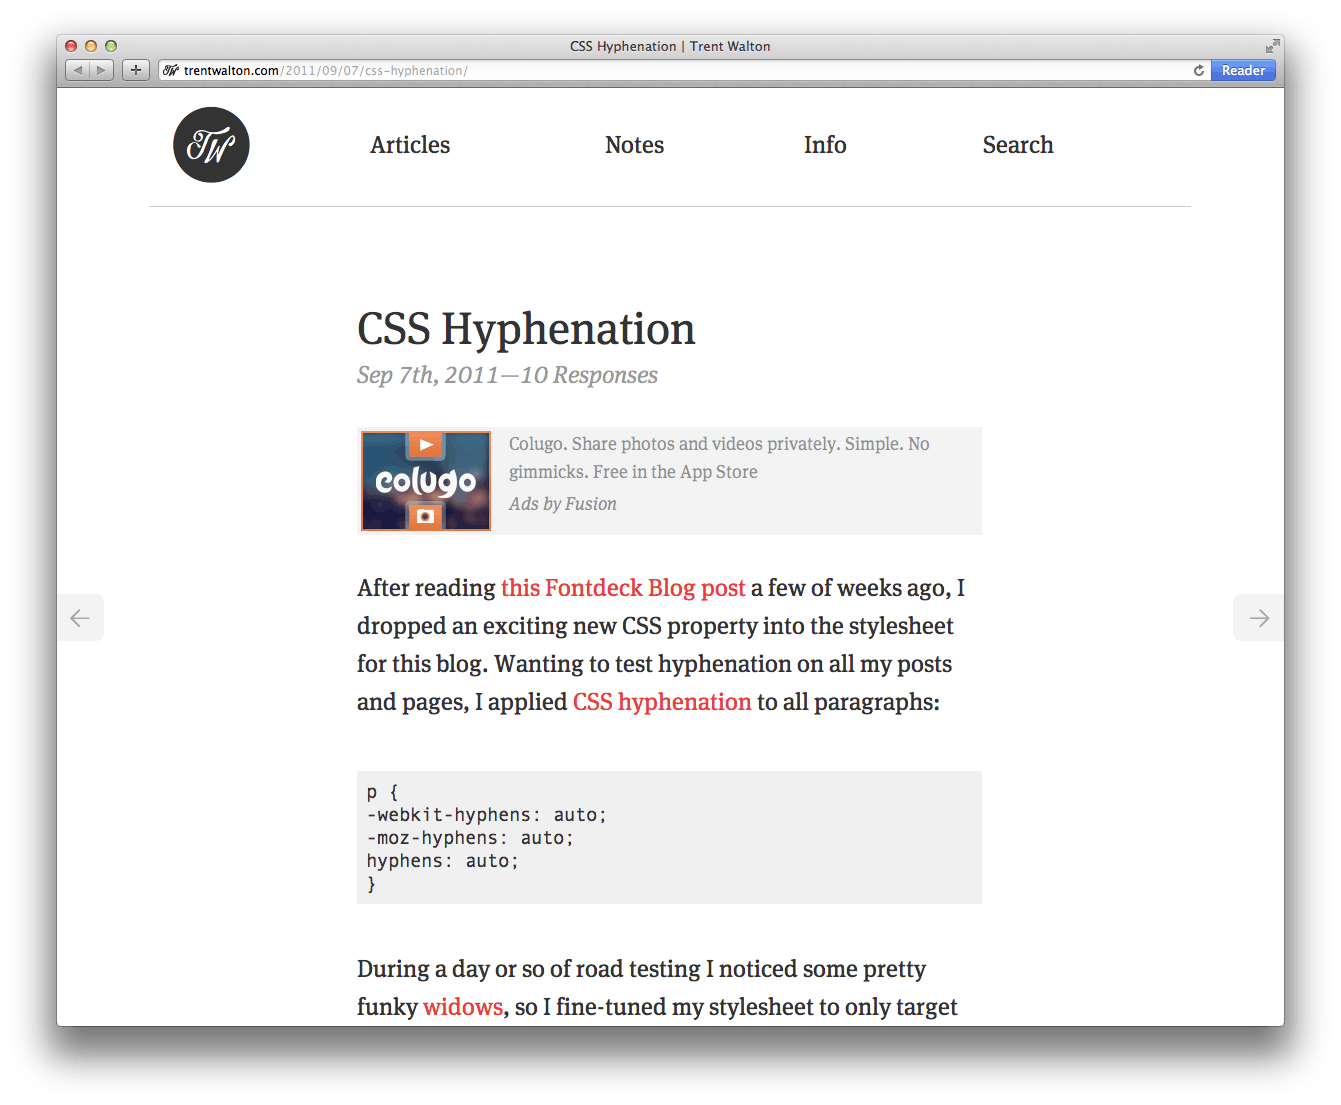 CSS Hyphenation | Trent Walton